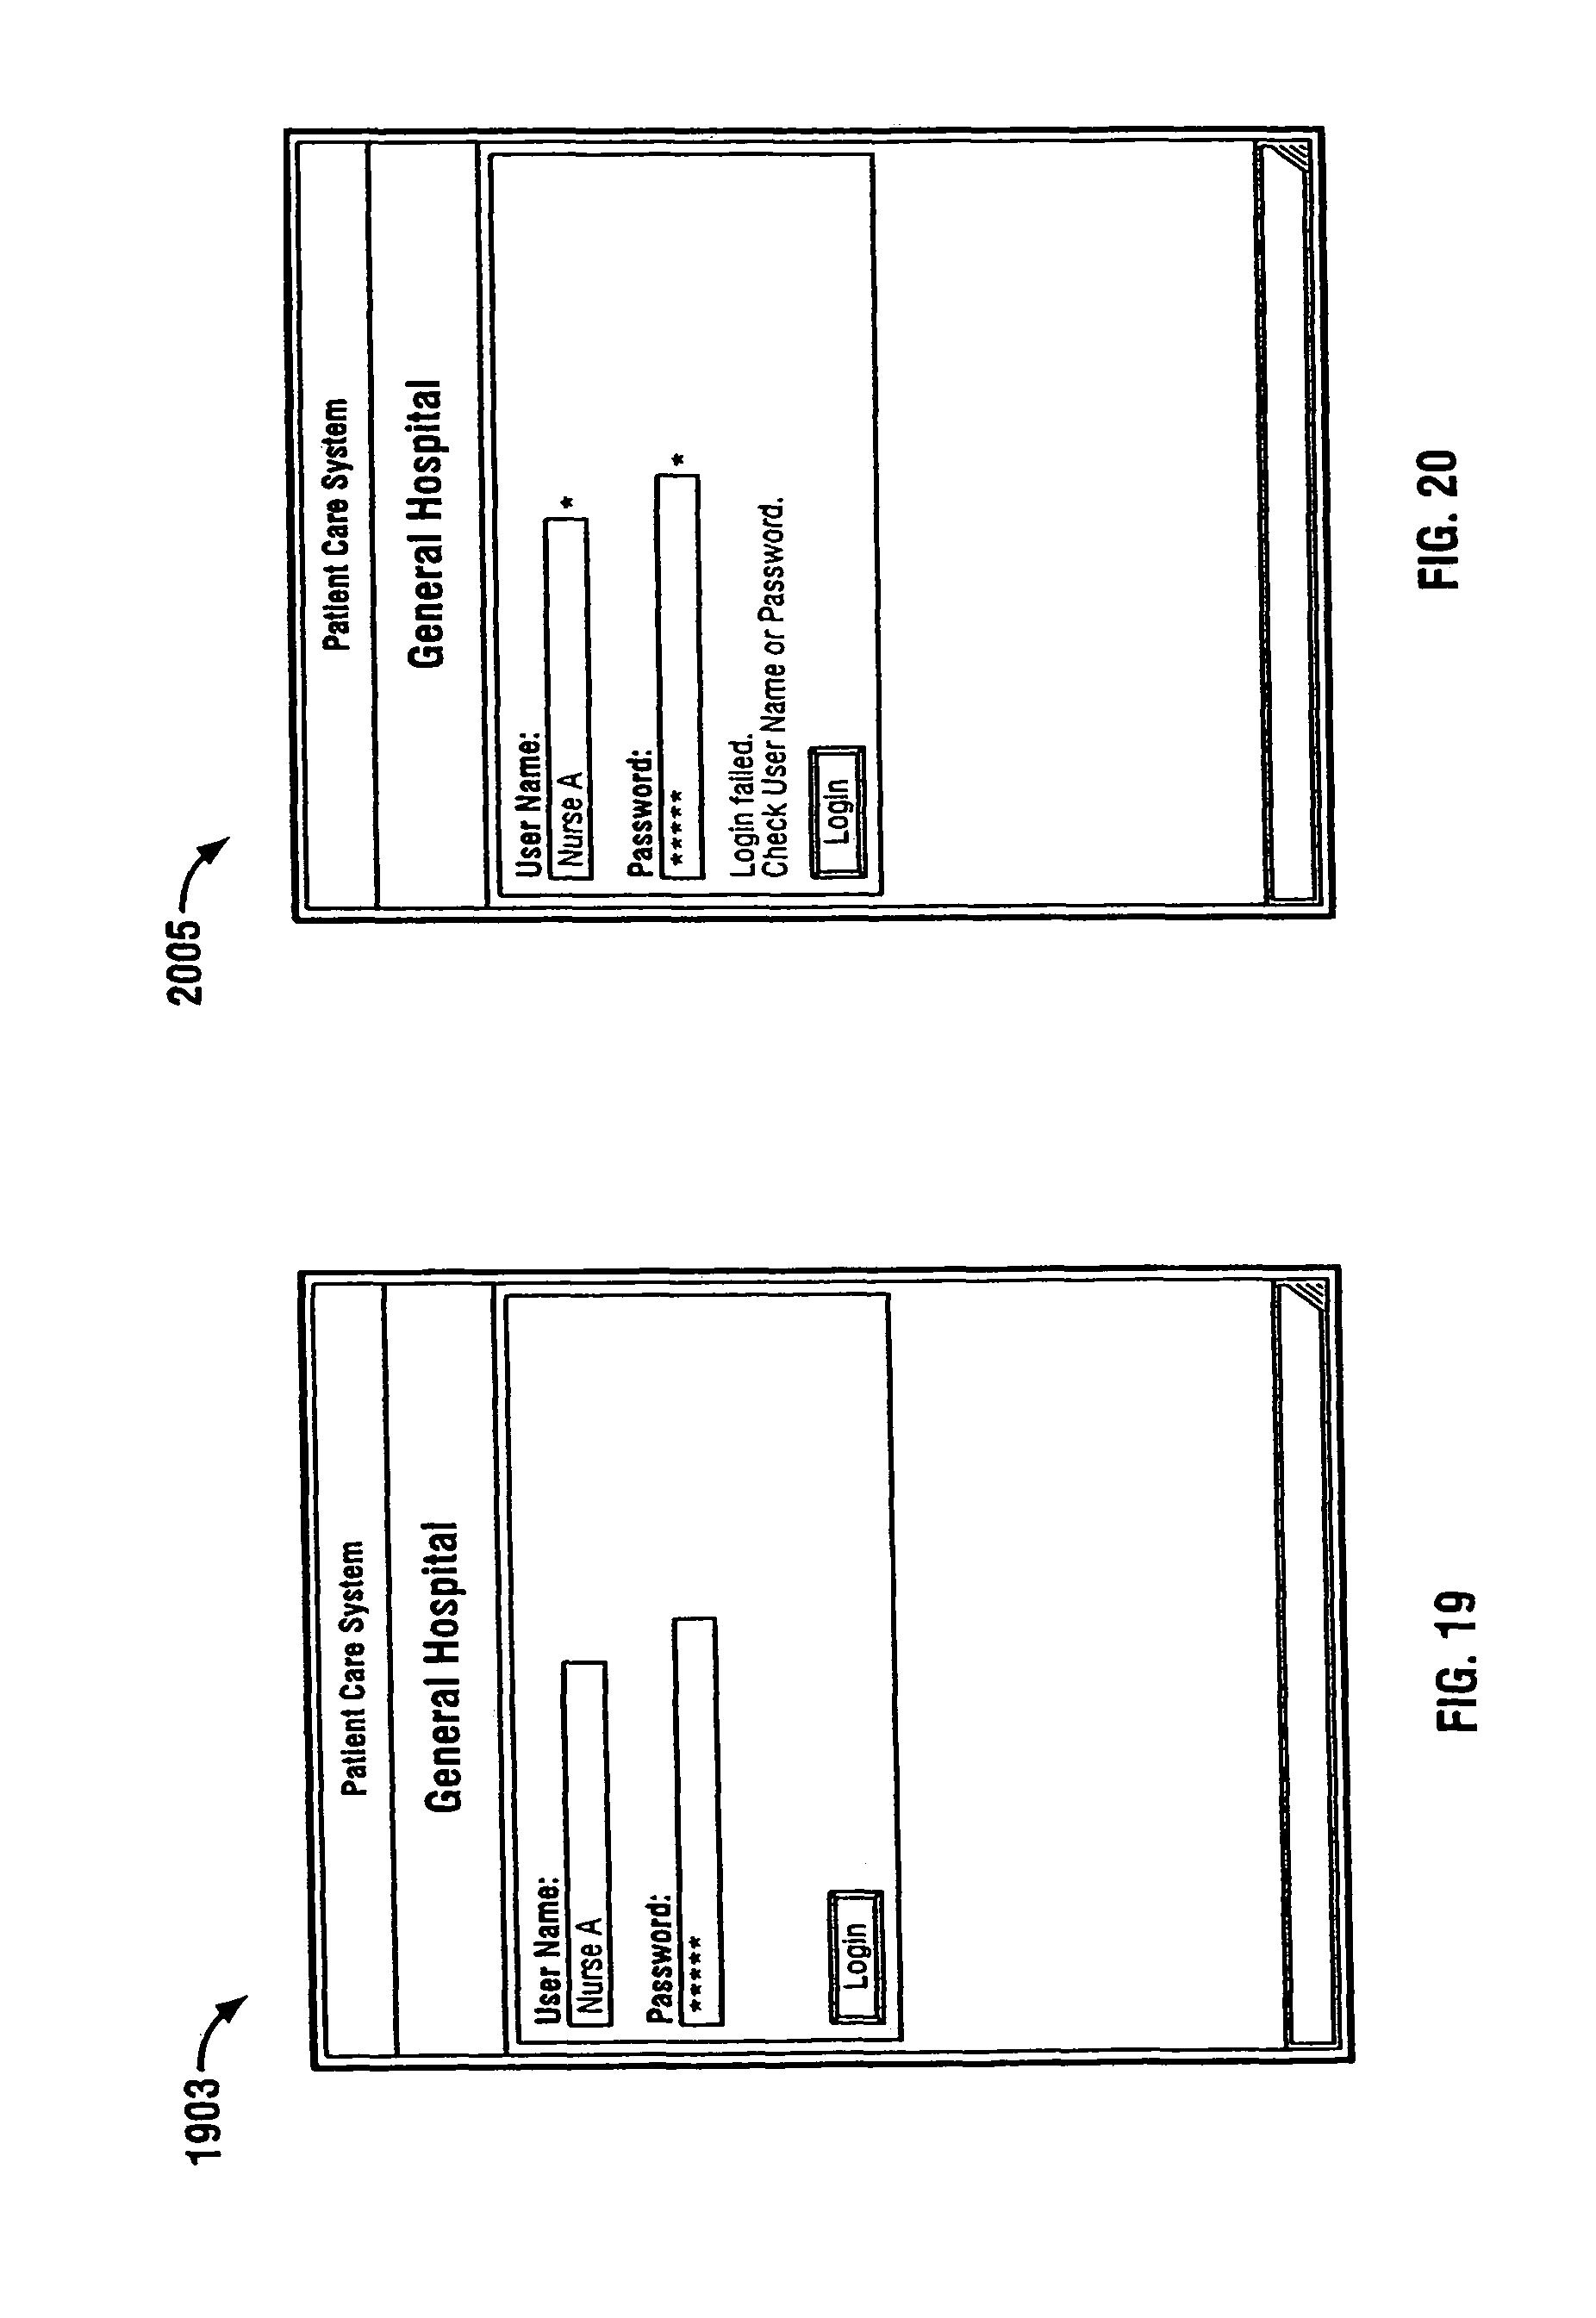 Patent US 8,234,128 B2